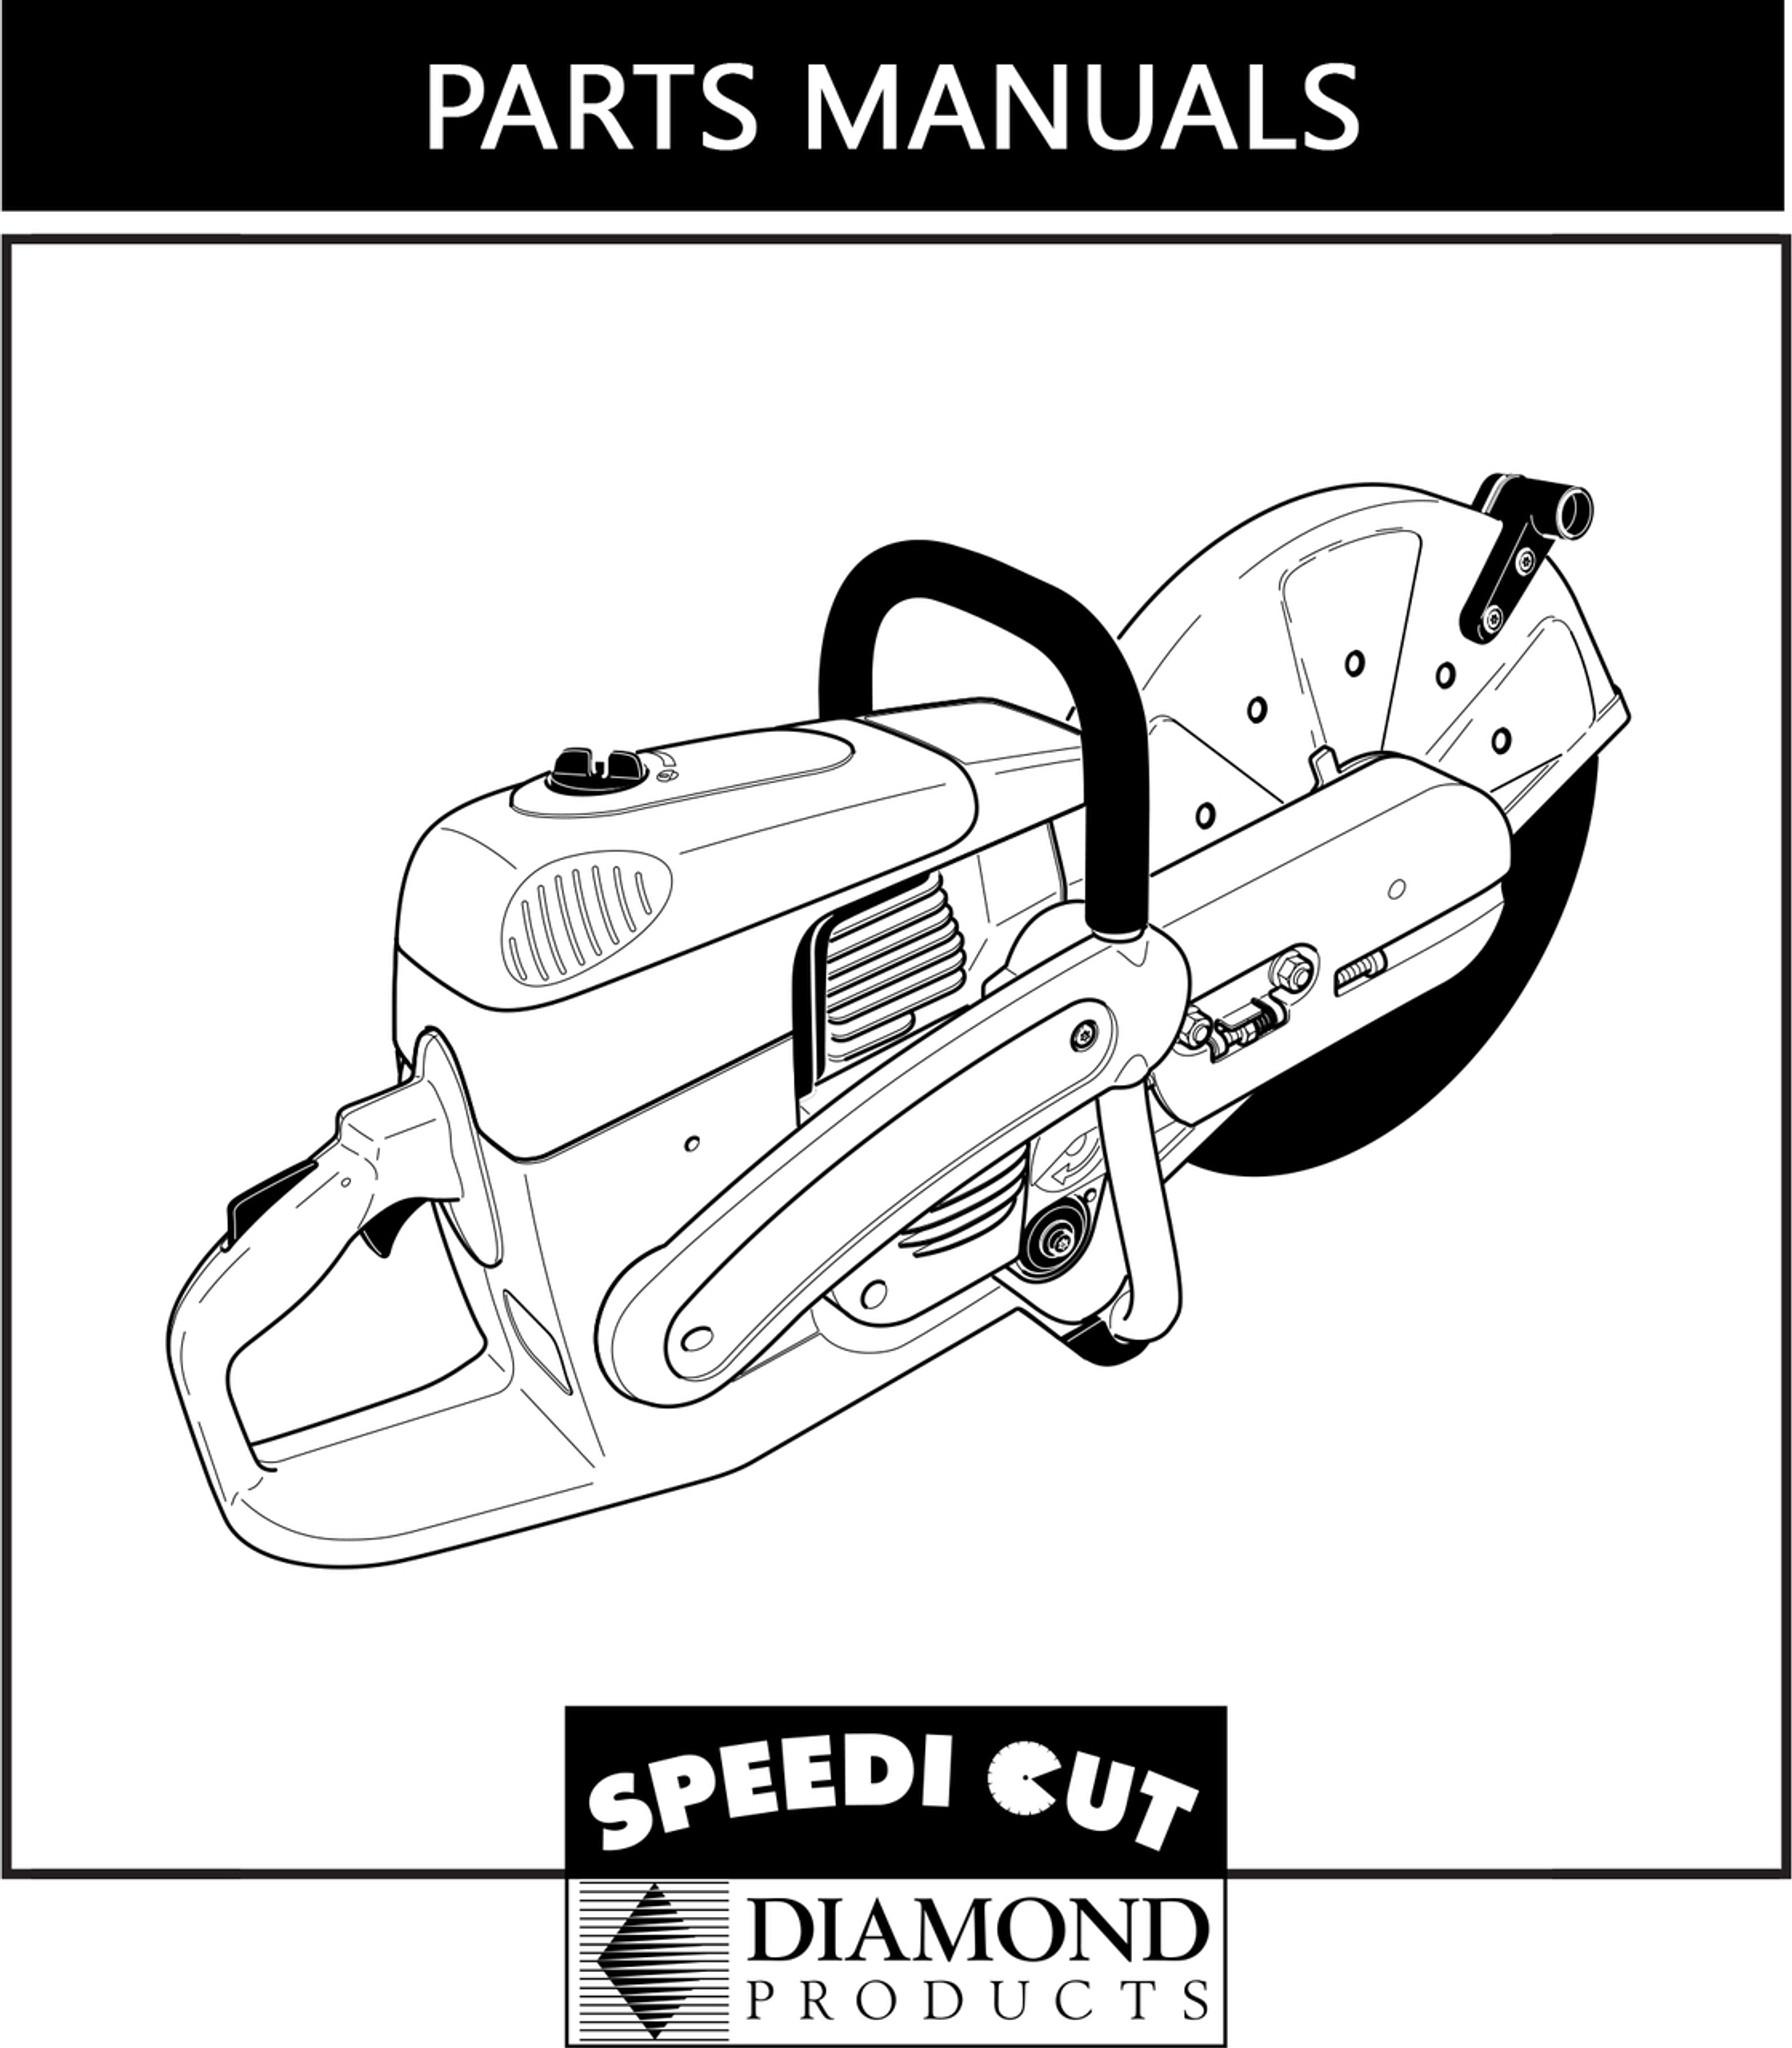 Diamond speedicut sc7312, sc7314 and sc8116 and 50 similar items.